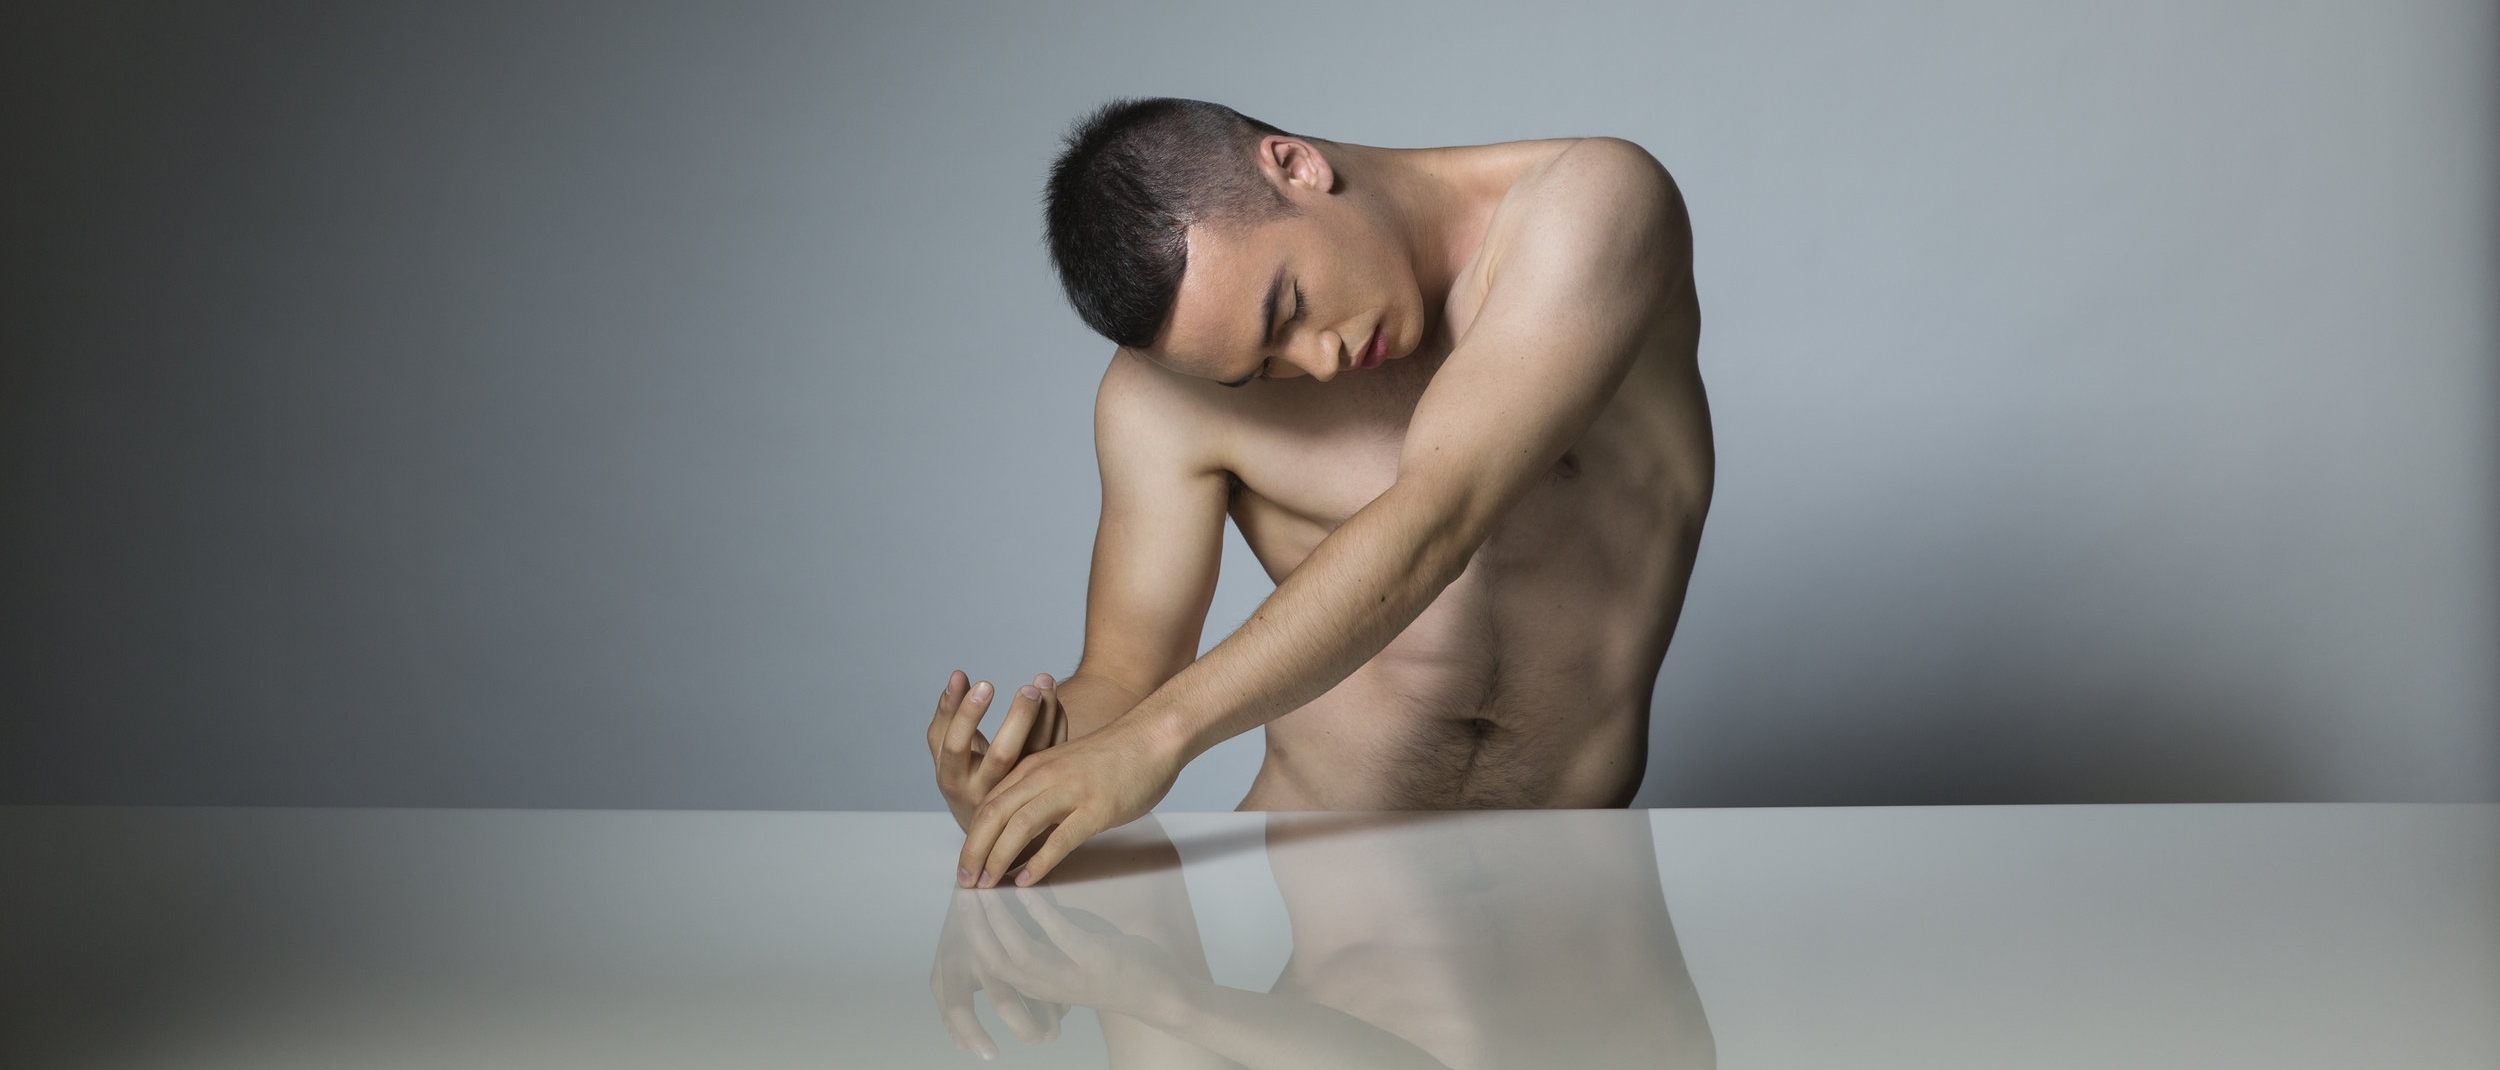 Photoshoot for   Peggy Baker Dance Projects   (Toronto, Canada). Photo by Aleksandar Antonijevic.